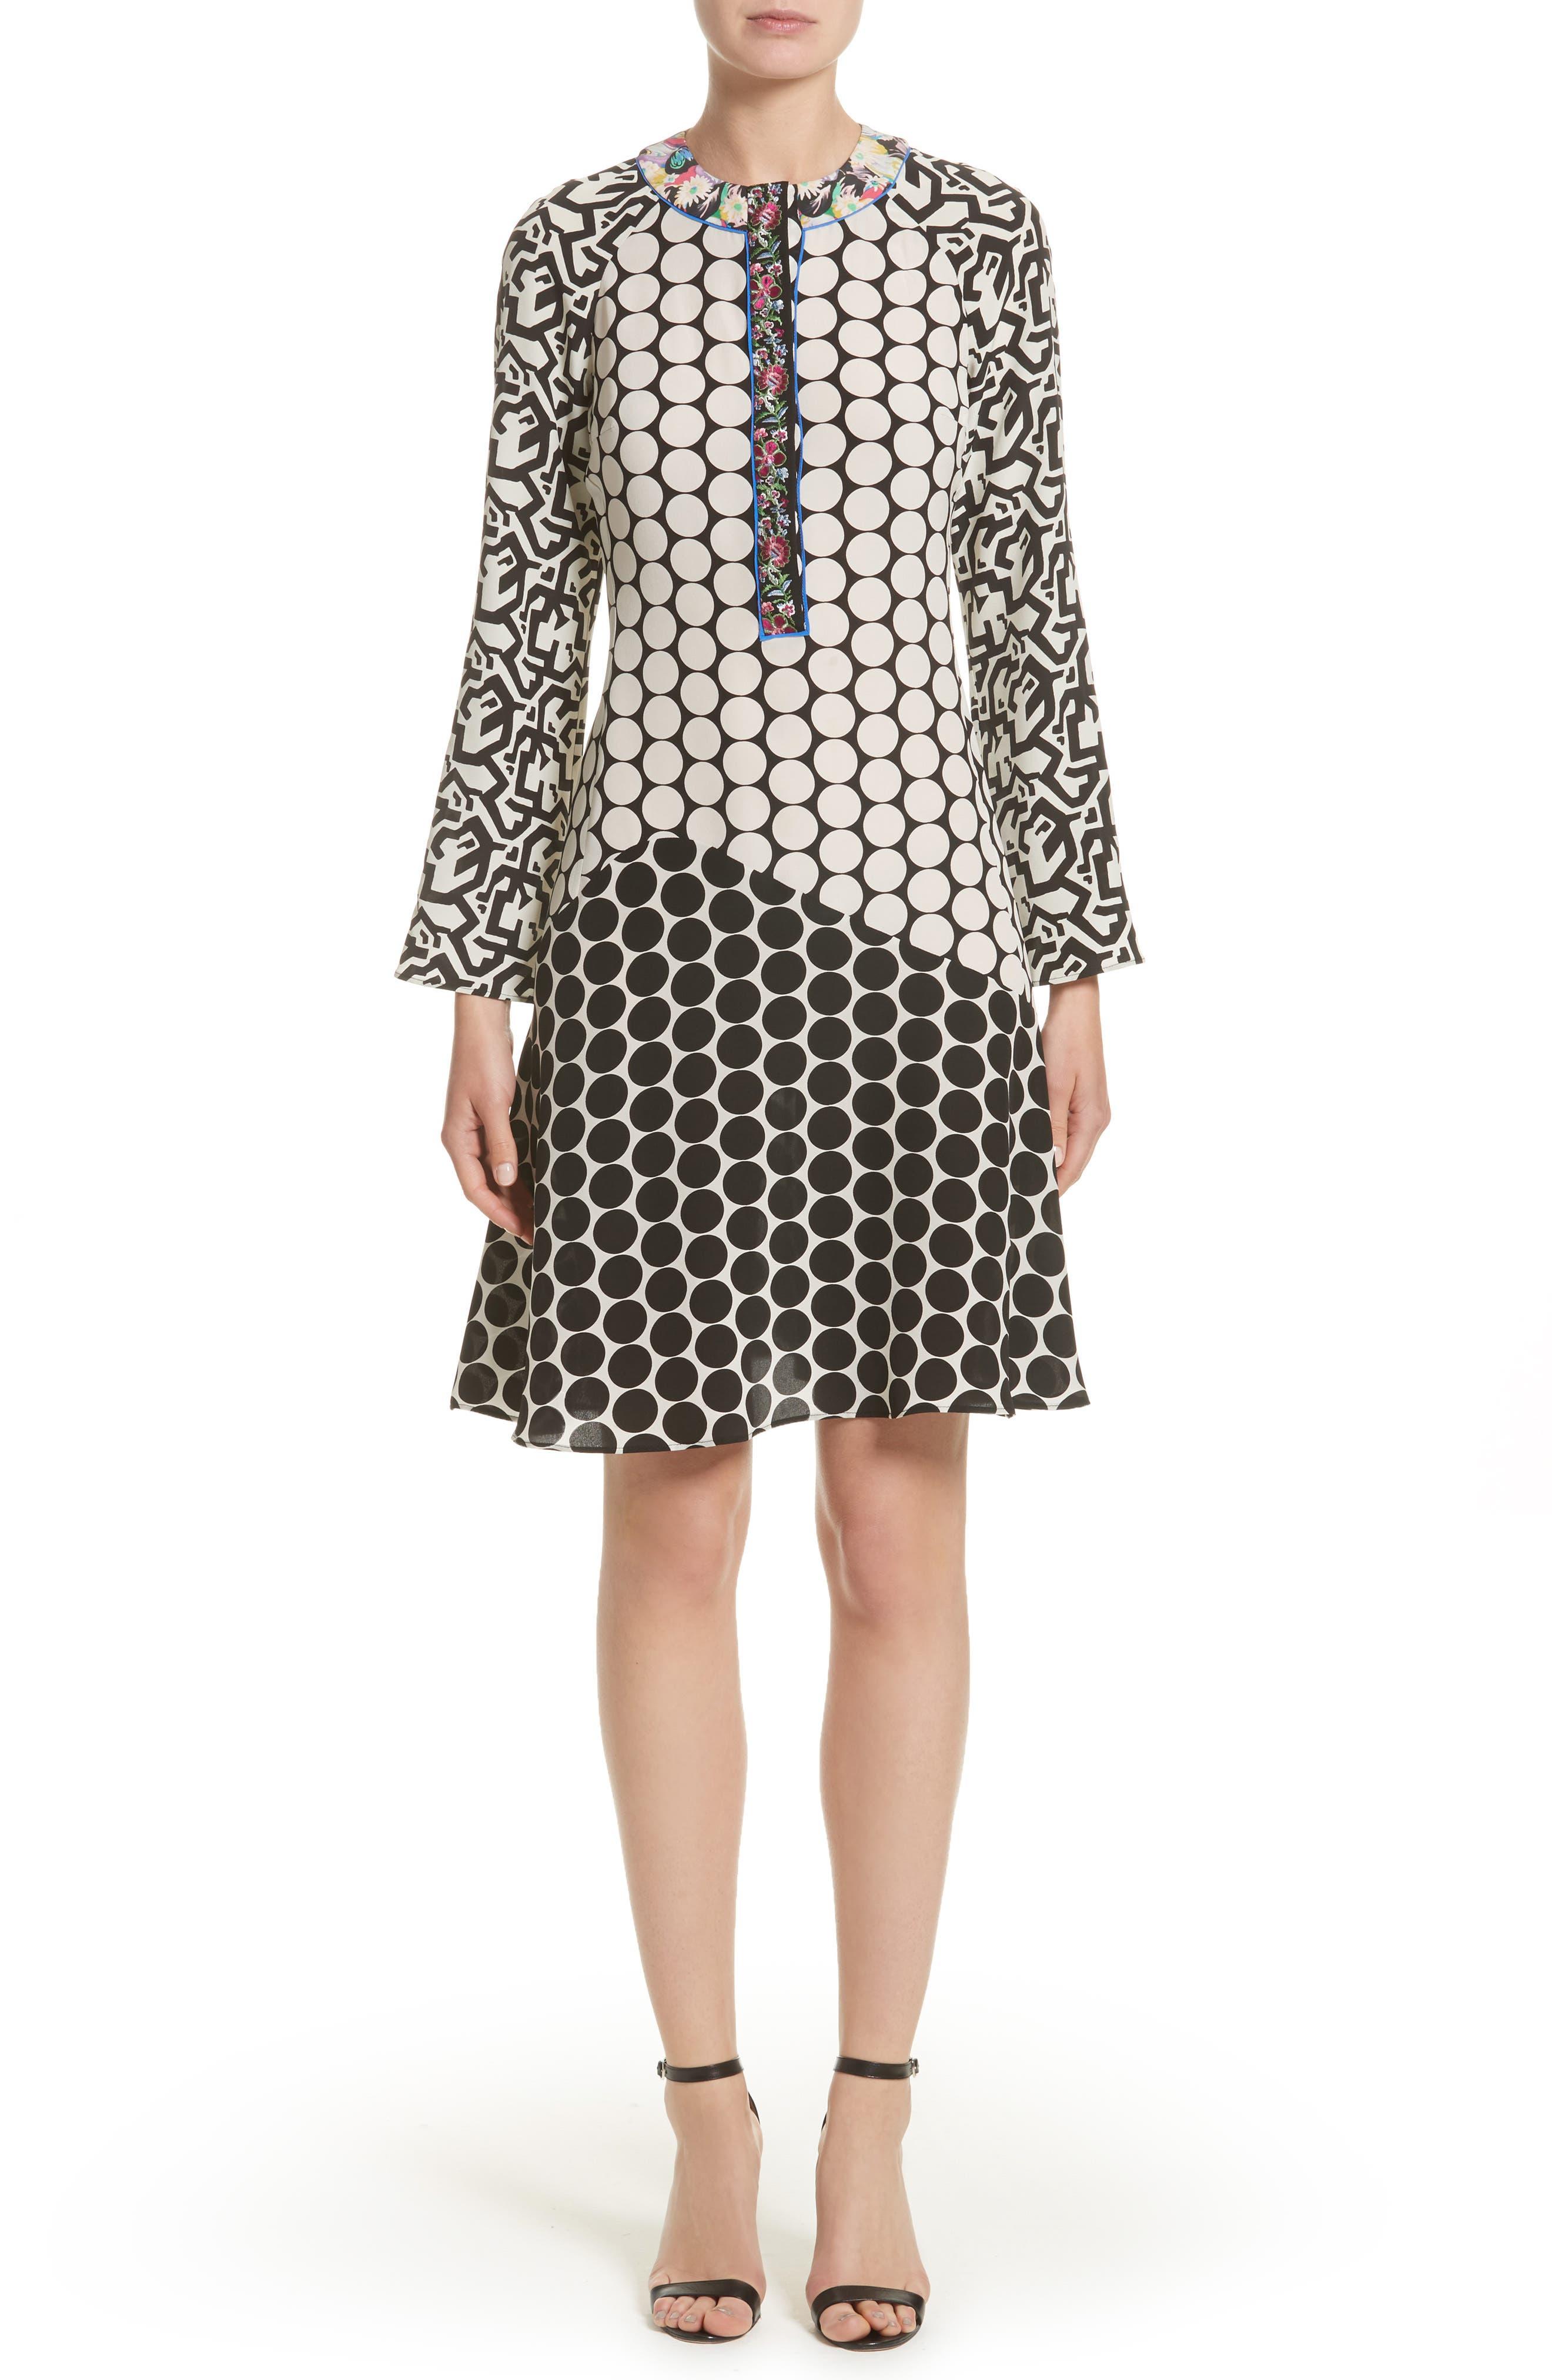 Main Image - Etro Polka Dot Print Silk Crêpe de Chine Flutter Dress